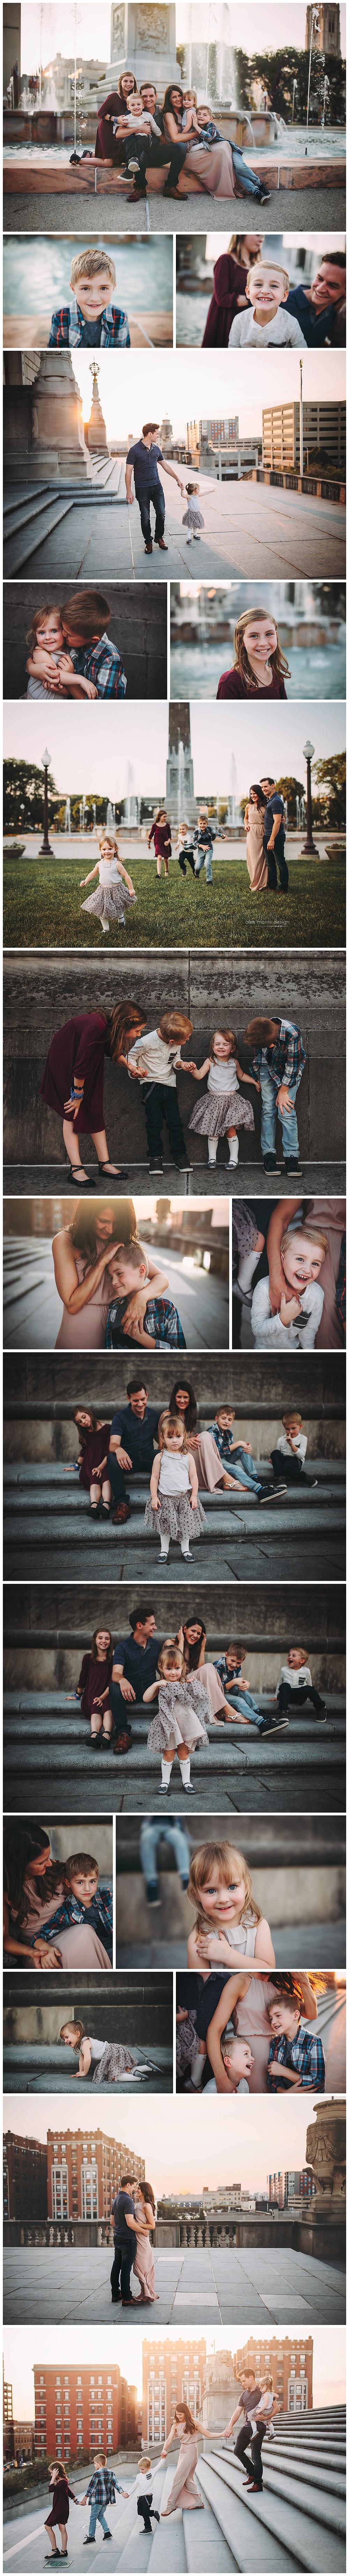 Indianapolis Family Photographer | Alex Morris Design